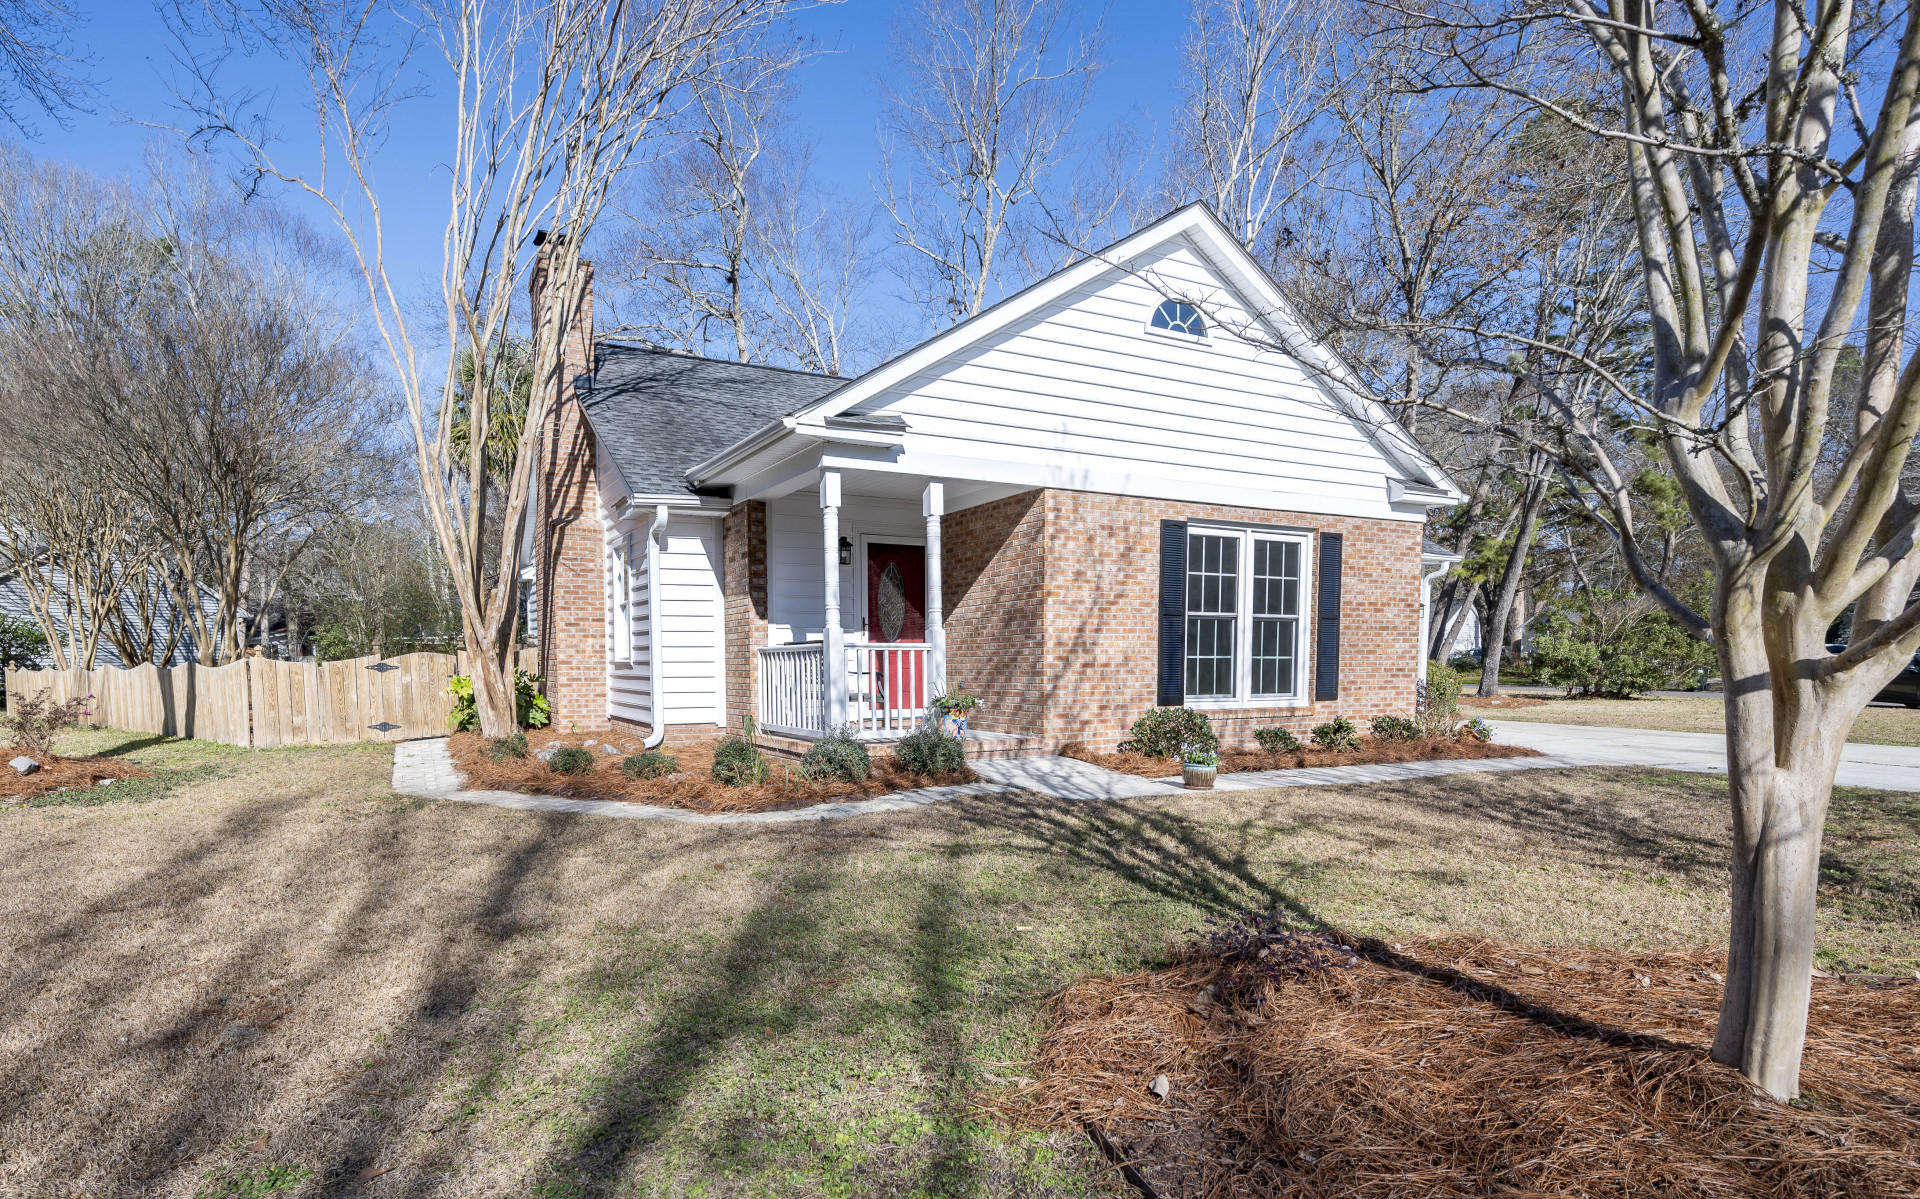 101 New Spring Court Summerville, SC 29485